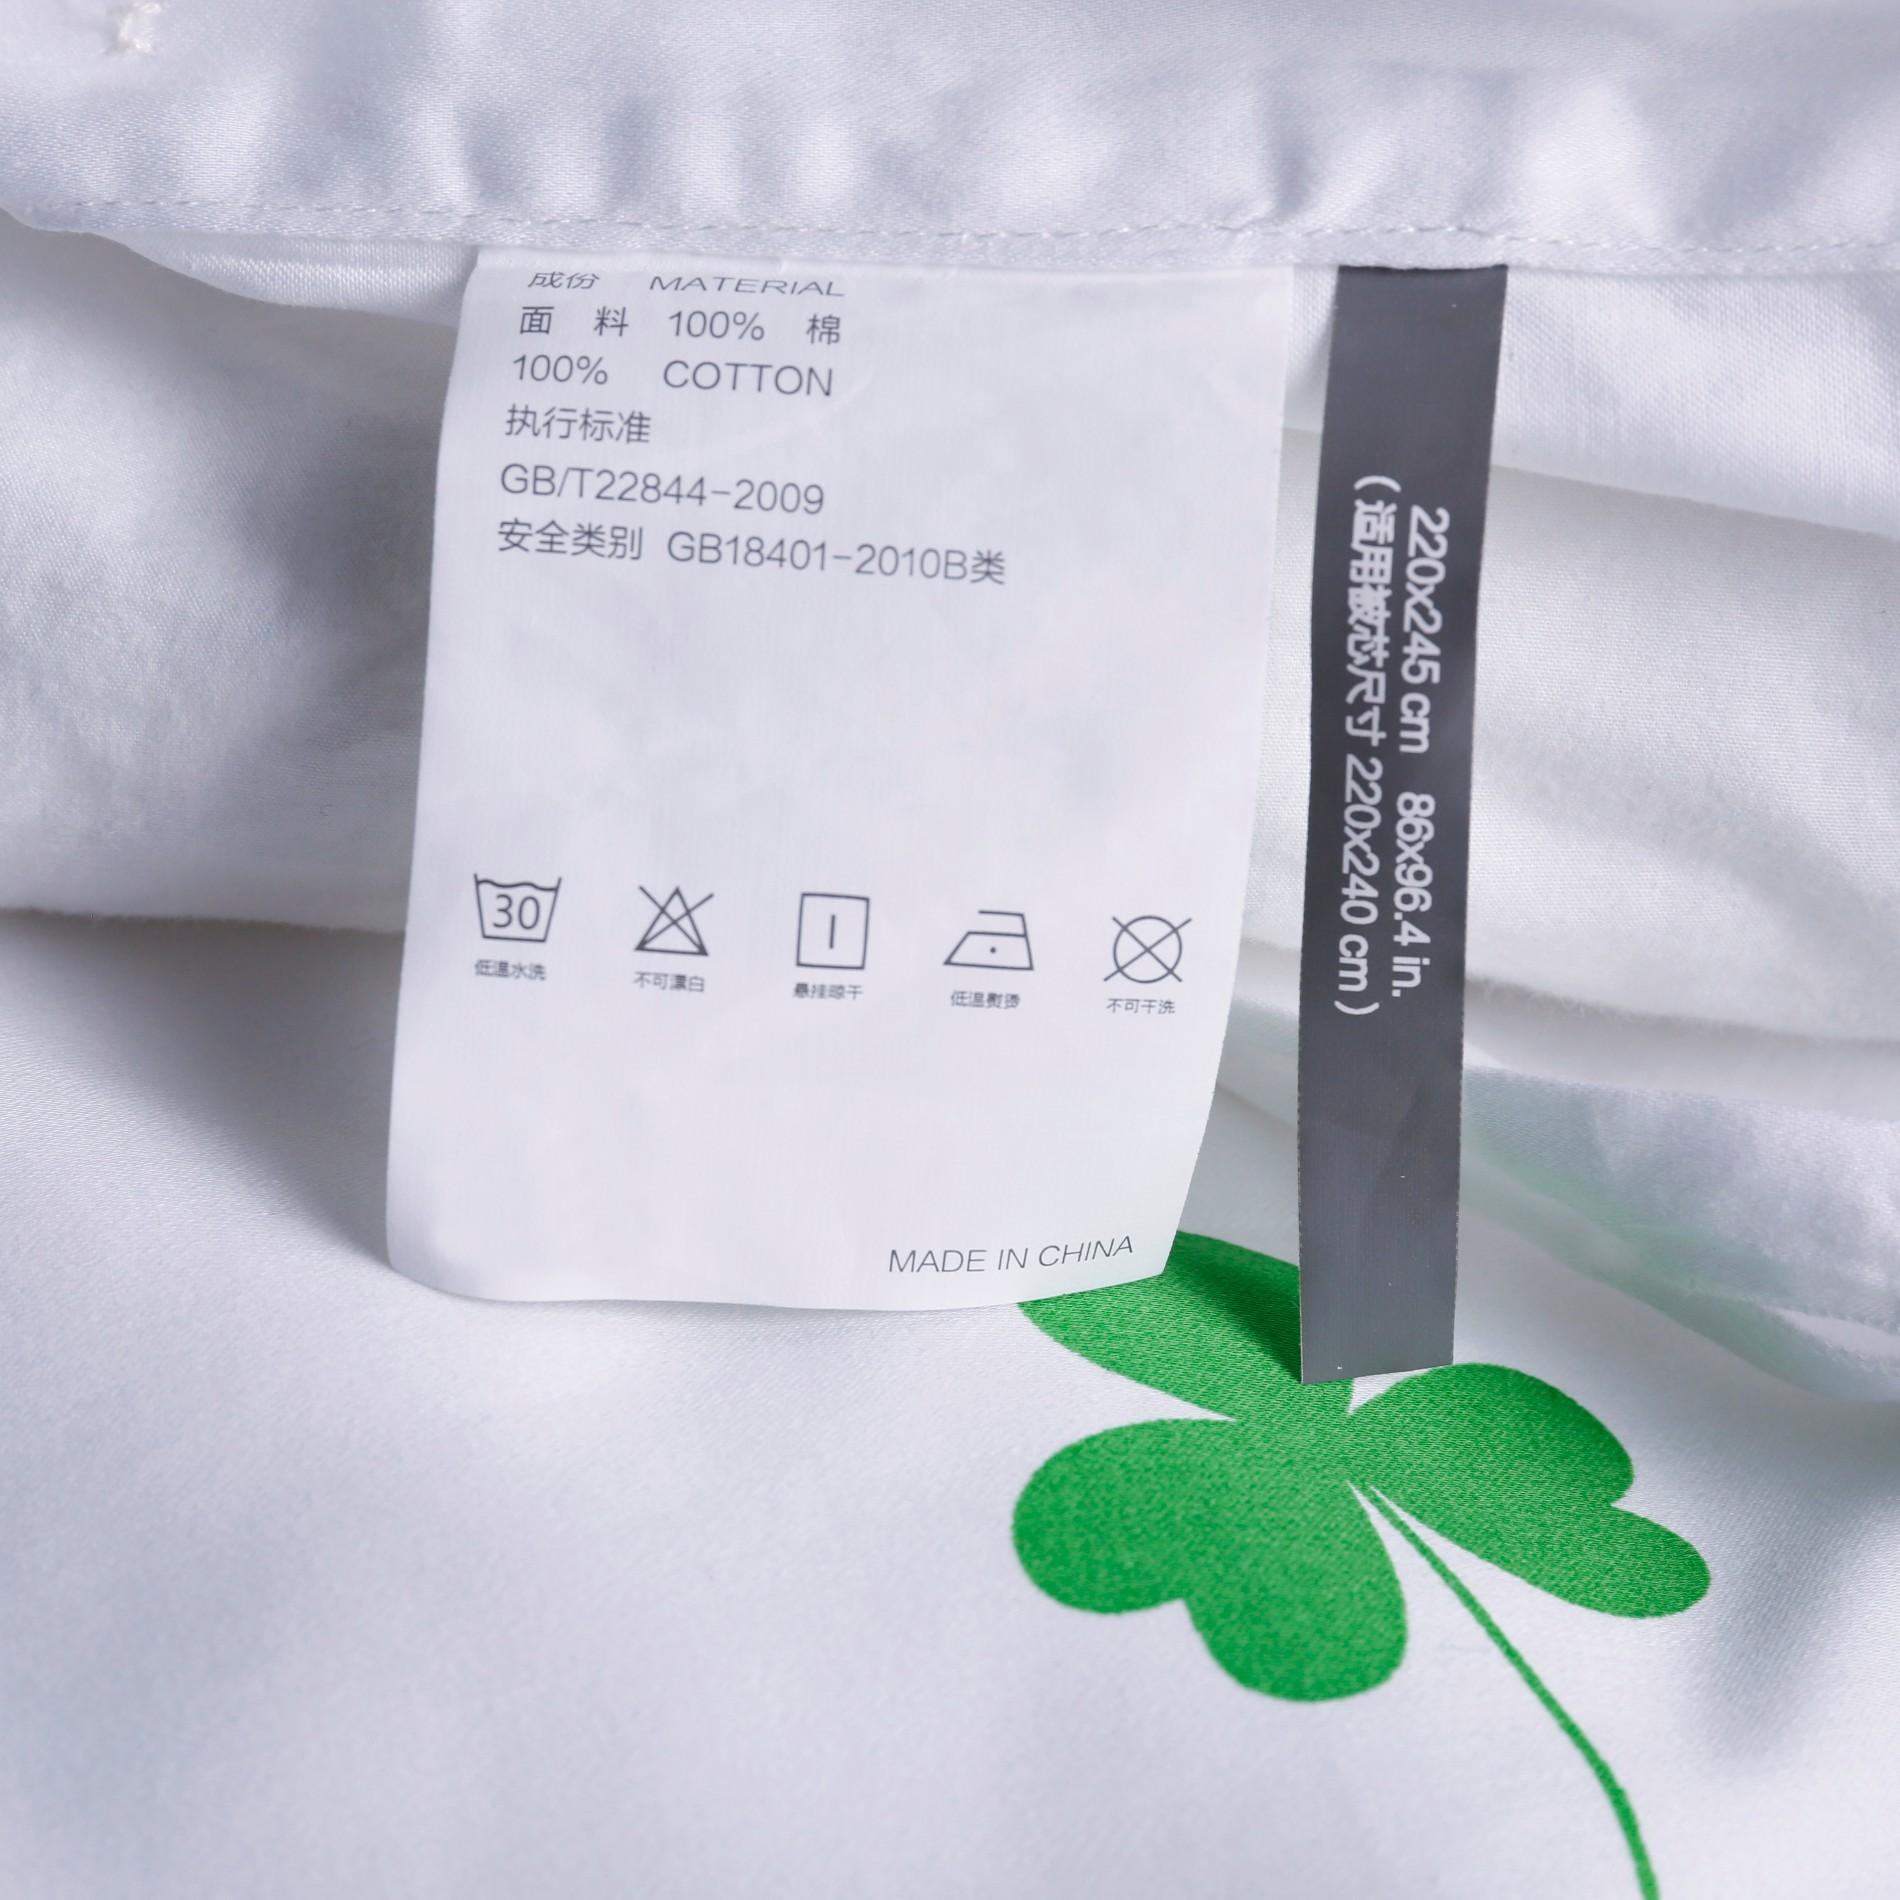 Home Textile Bedding Set Manufacturers, Home Textile Bedding Set Factory, Supply Home Textile Bedding Set